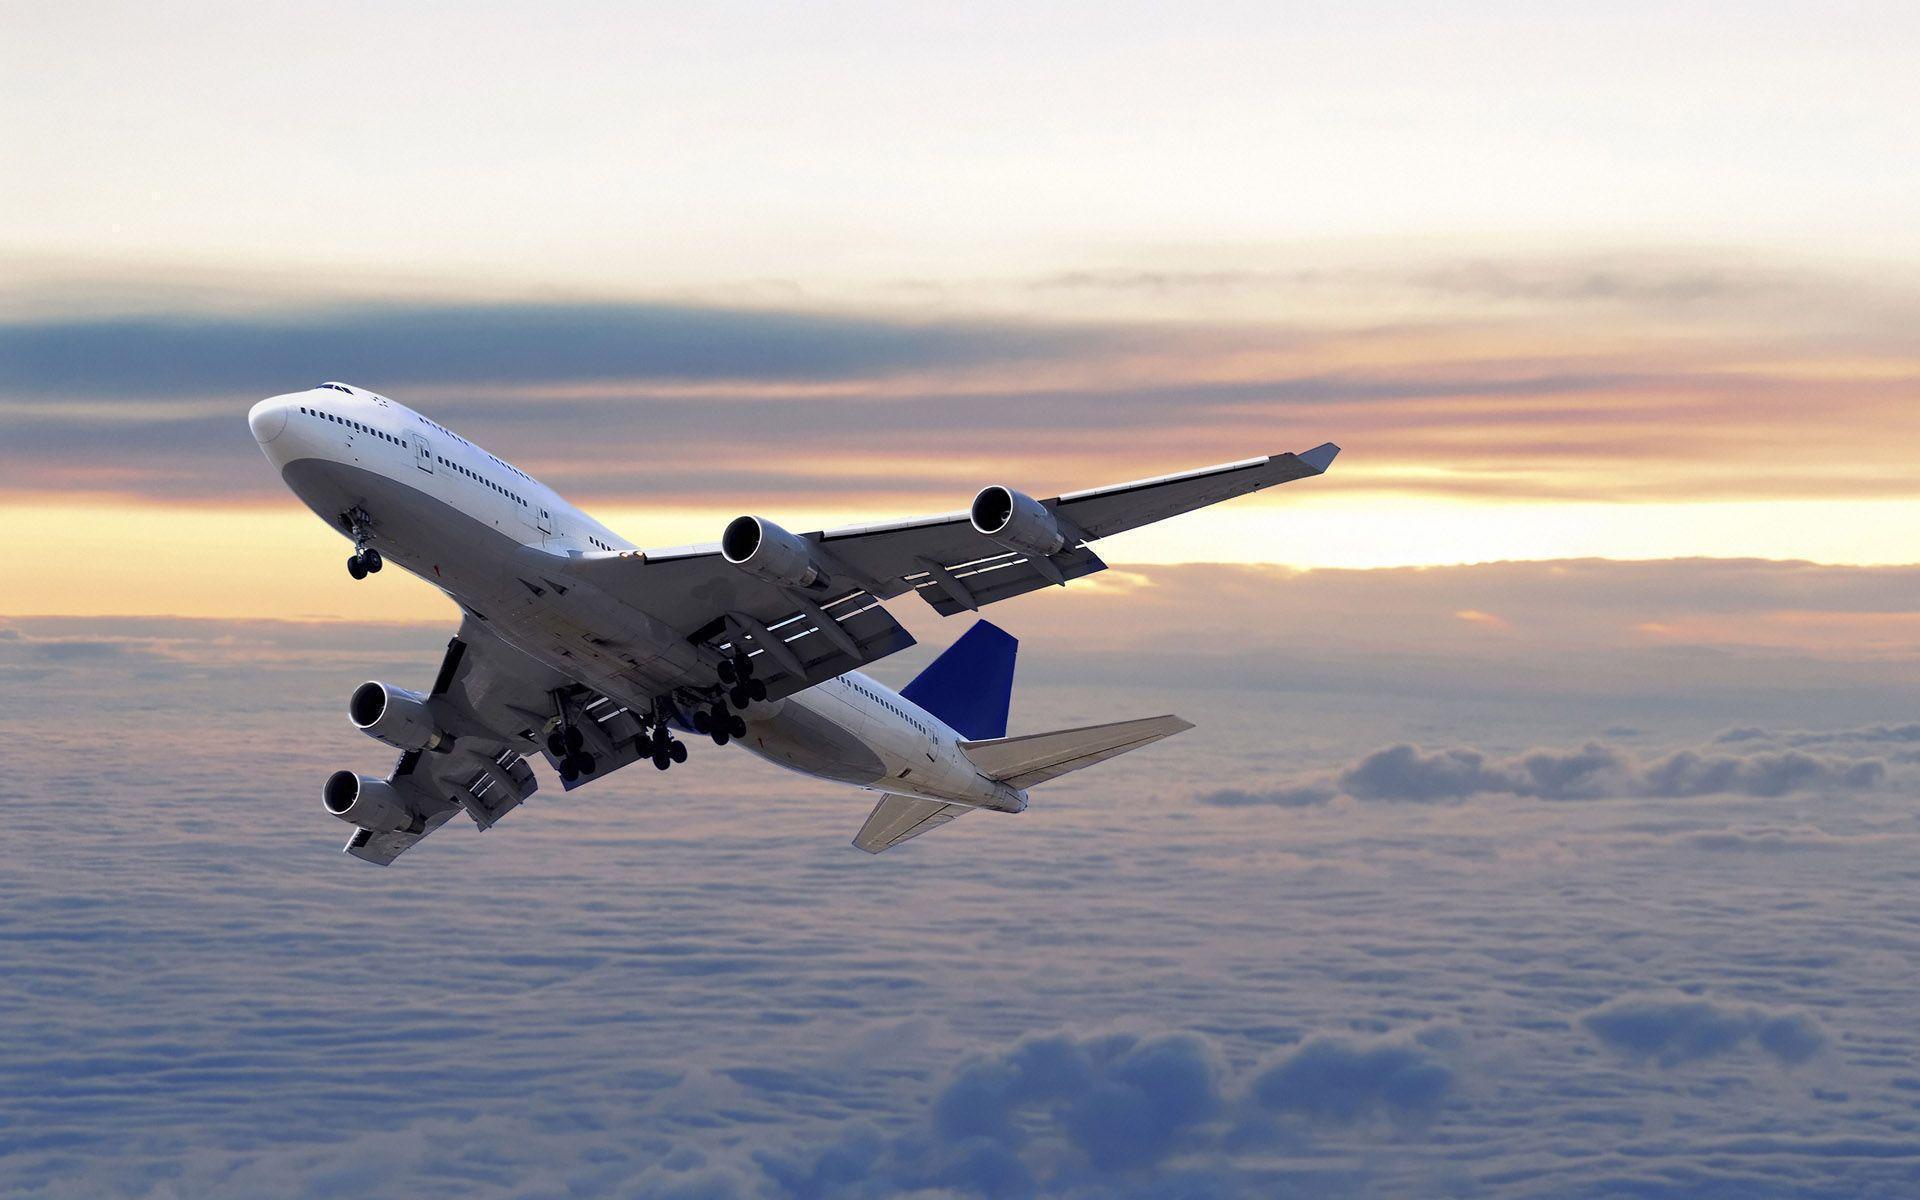 Jet Air Travel Agency